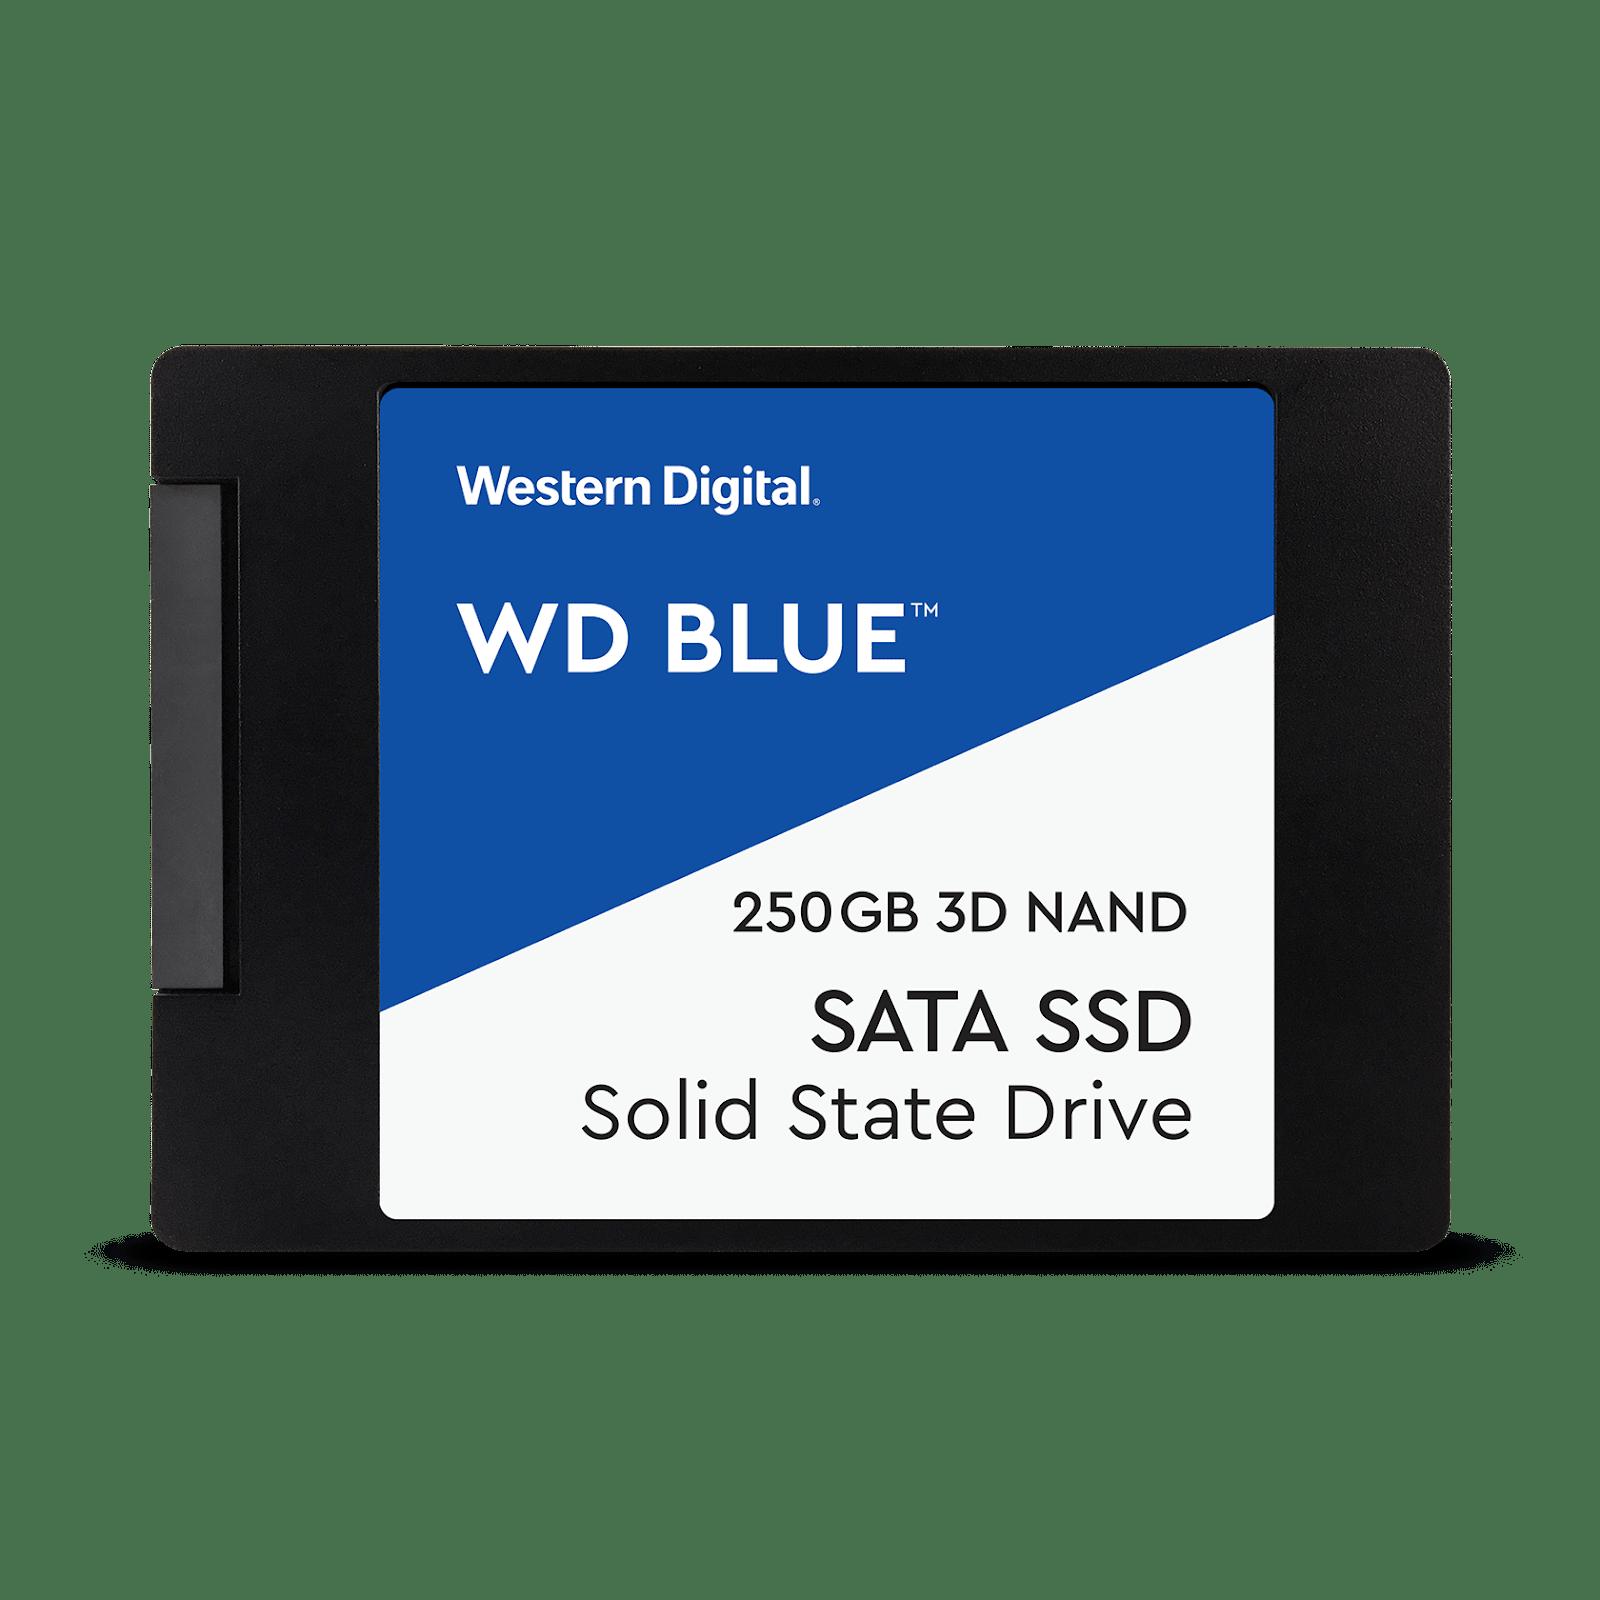 "WD Blue™ SATA SSD 2.5""/7mm cased   Western Digital Store"